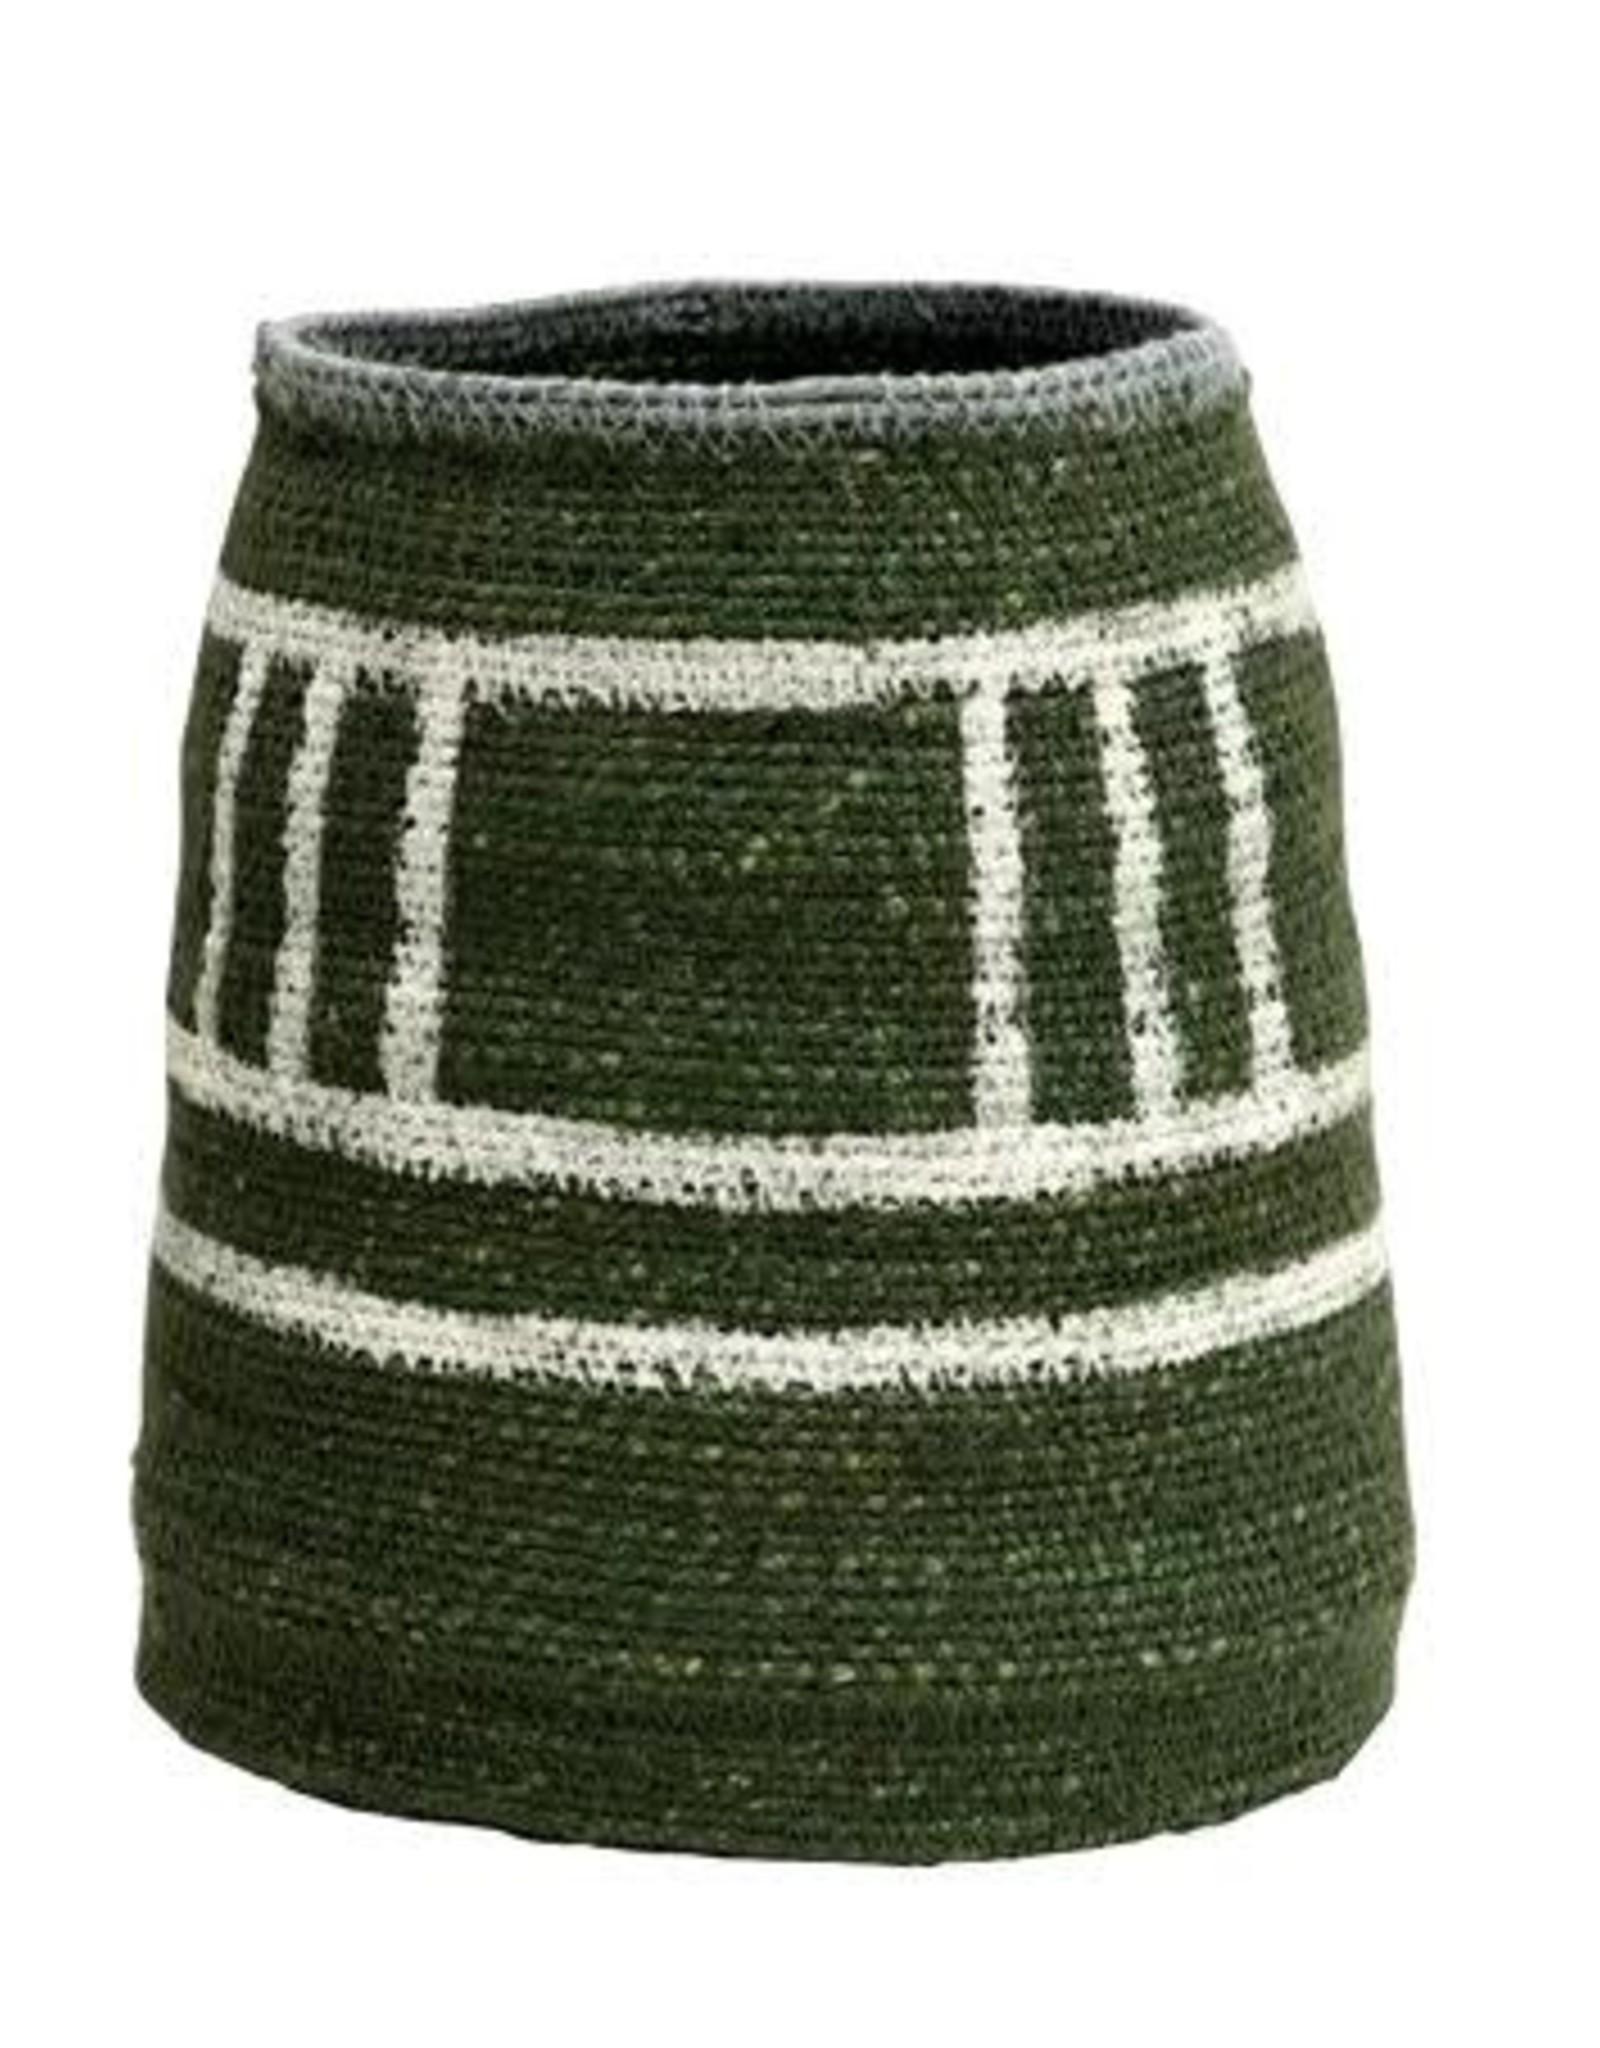 "Creative Co-op 6"" x 9"" H Hand-Woven Seagrass Basket, Green"